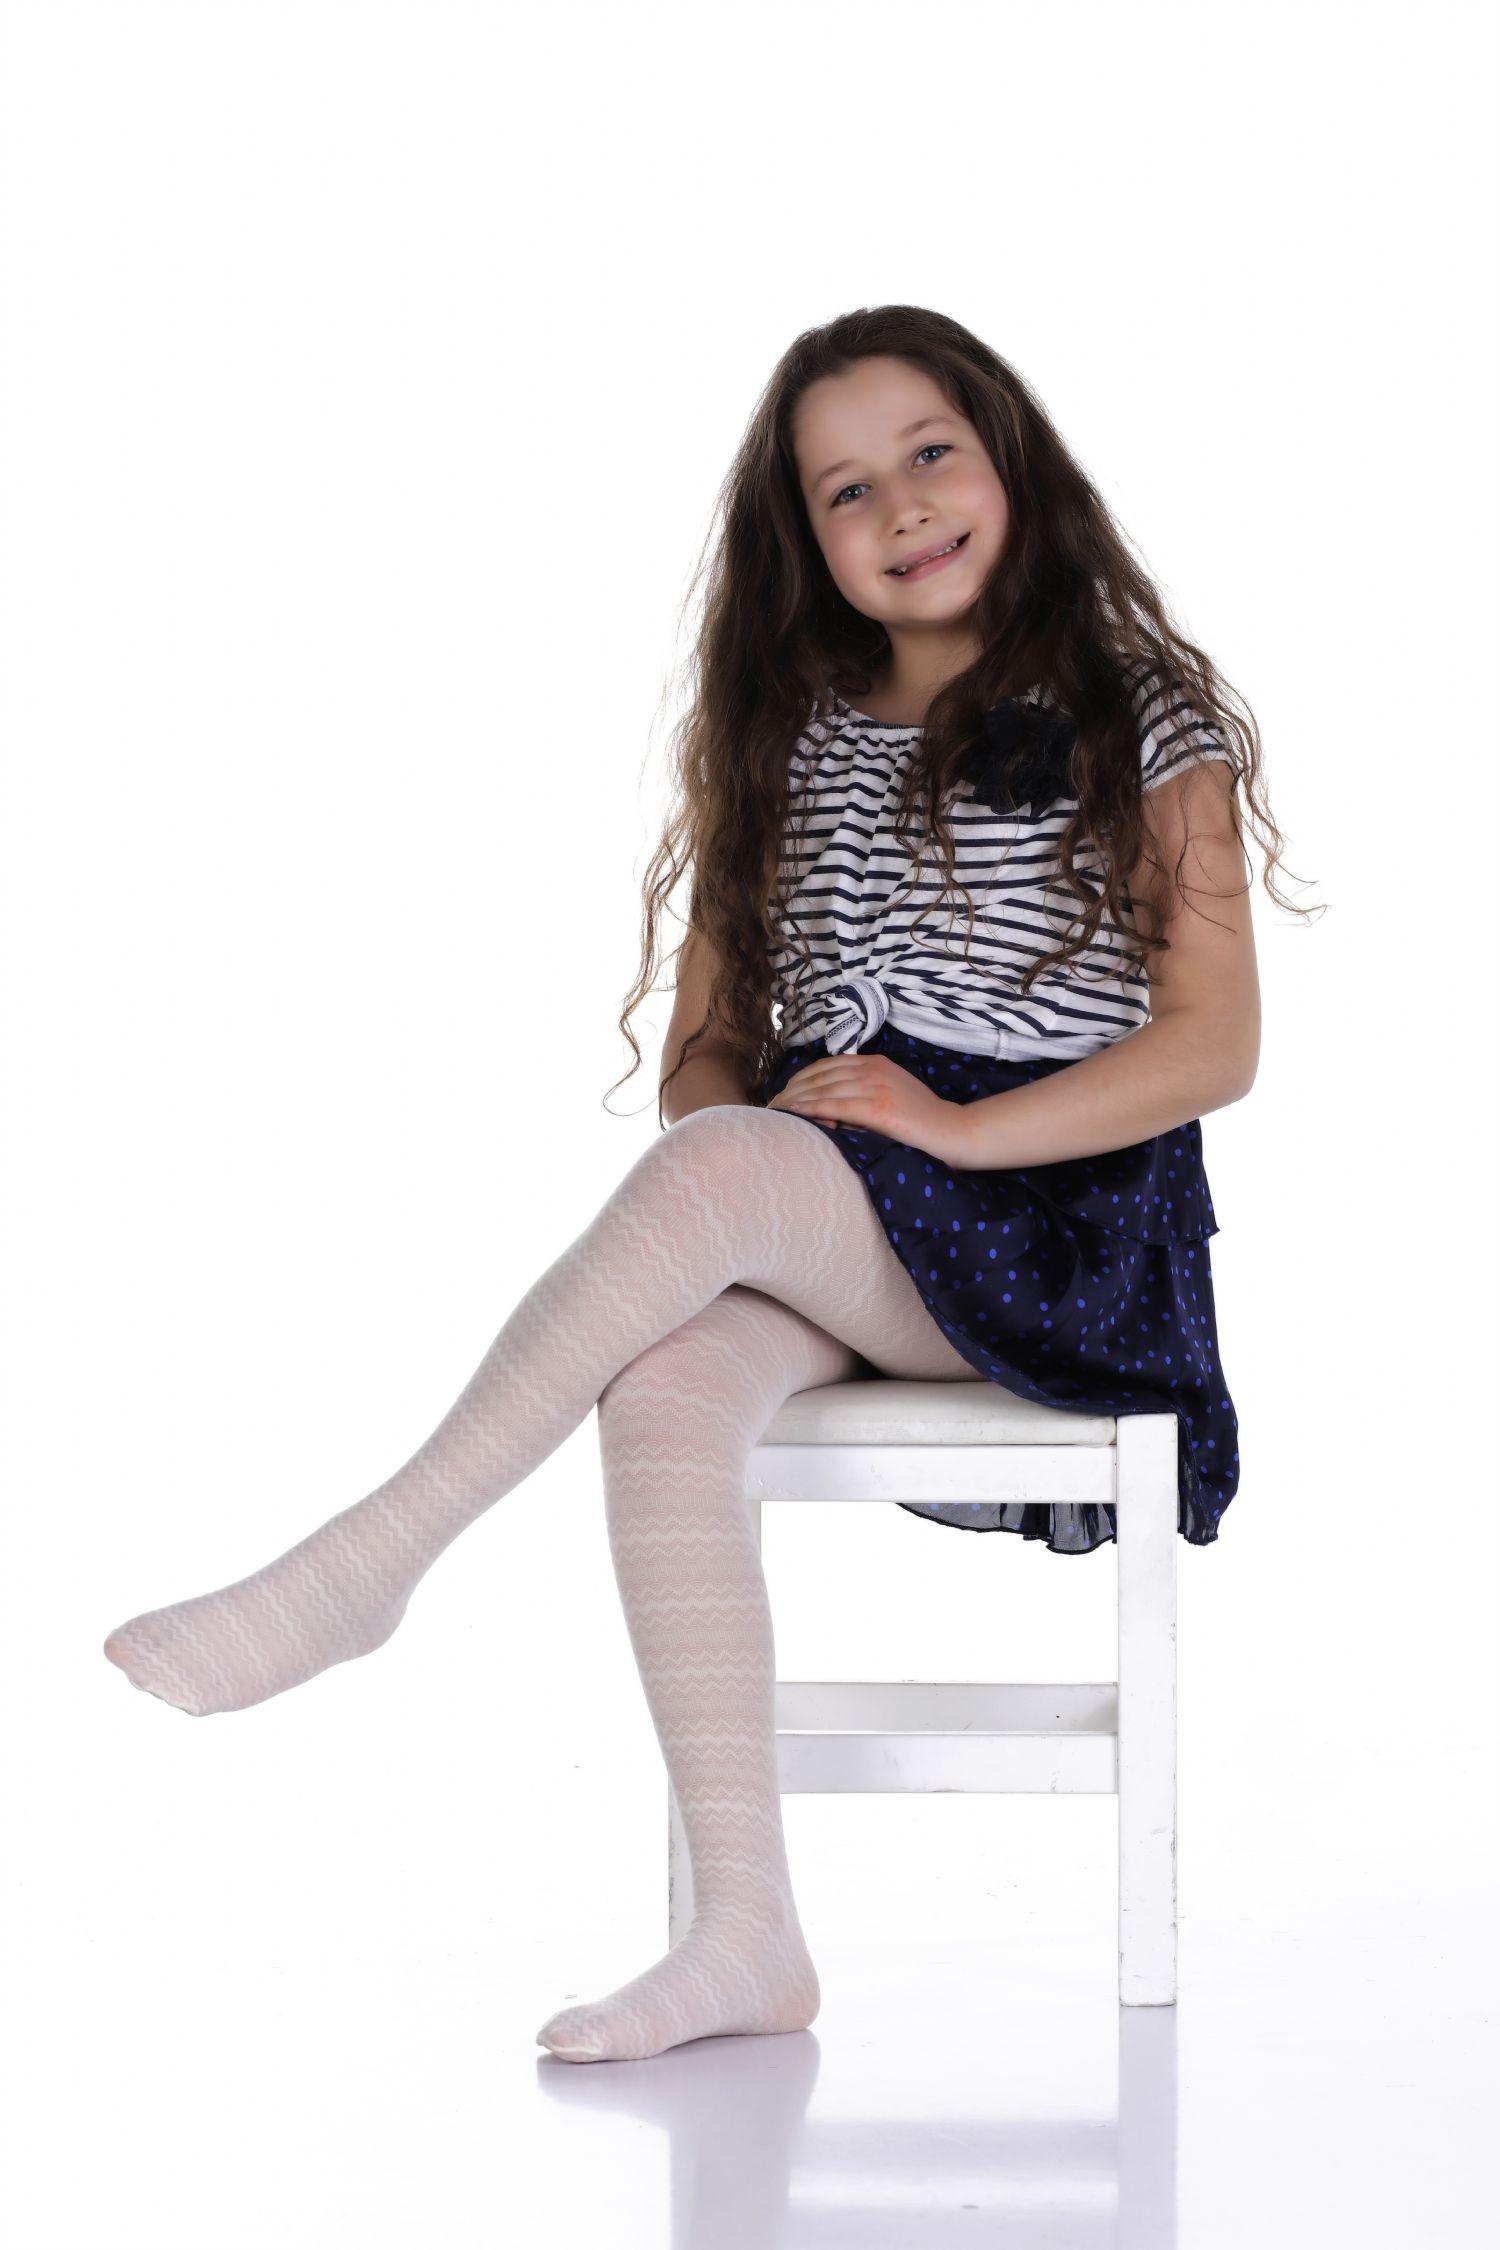 50 den kinder strumpfhosen m dchen elite style stocking. Black Bedroom Furniture Sets. Home Design Ideas